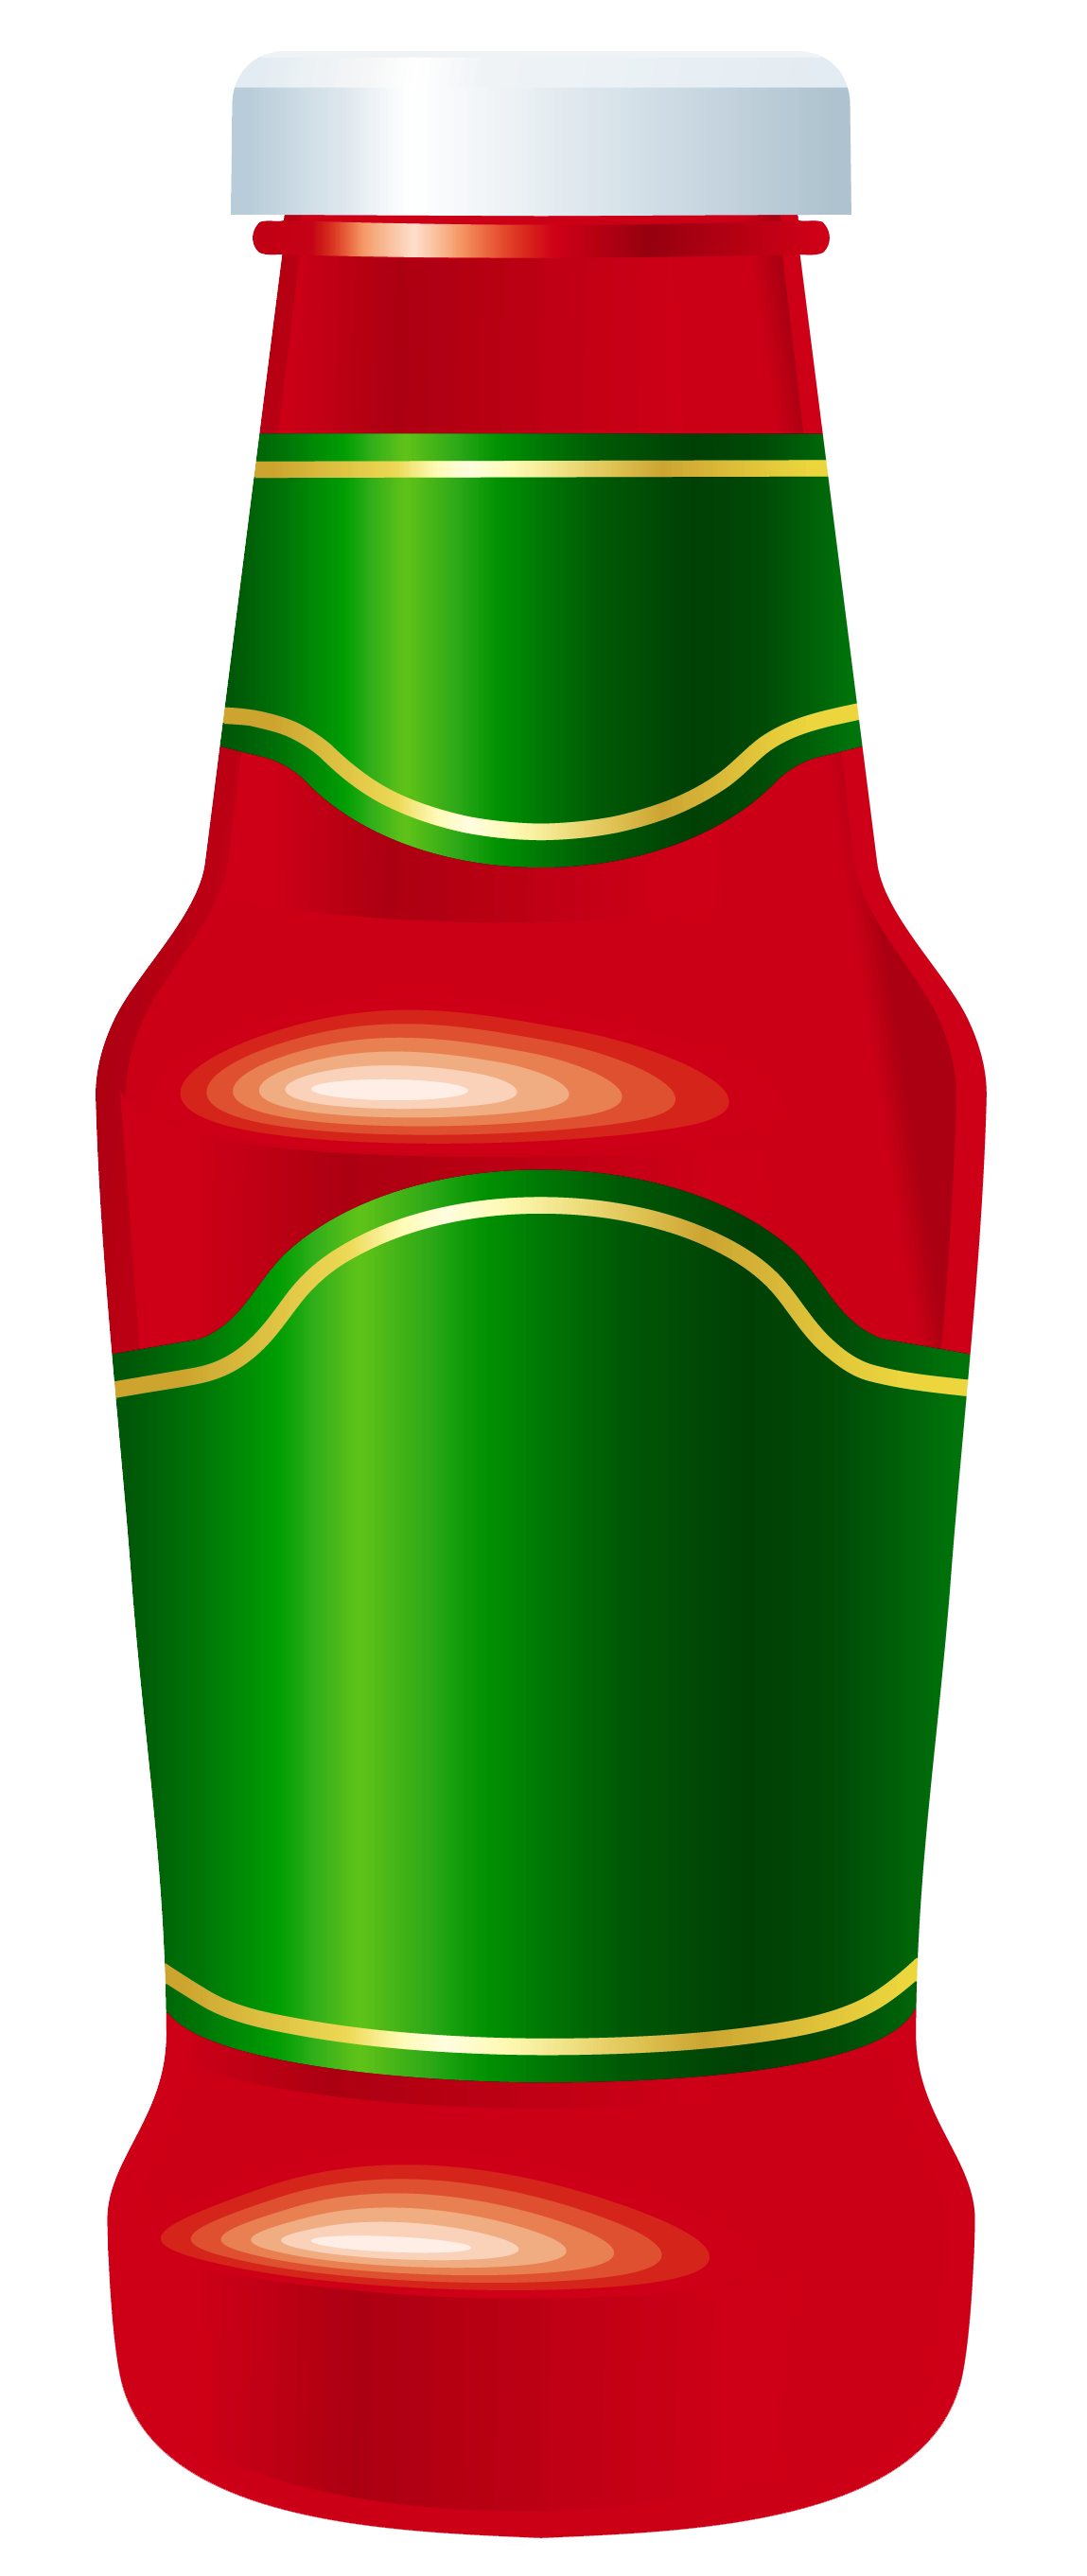 Ketchup clipart jar. Bottle png image gallery